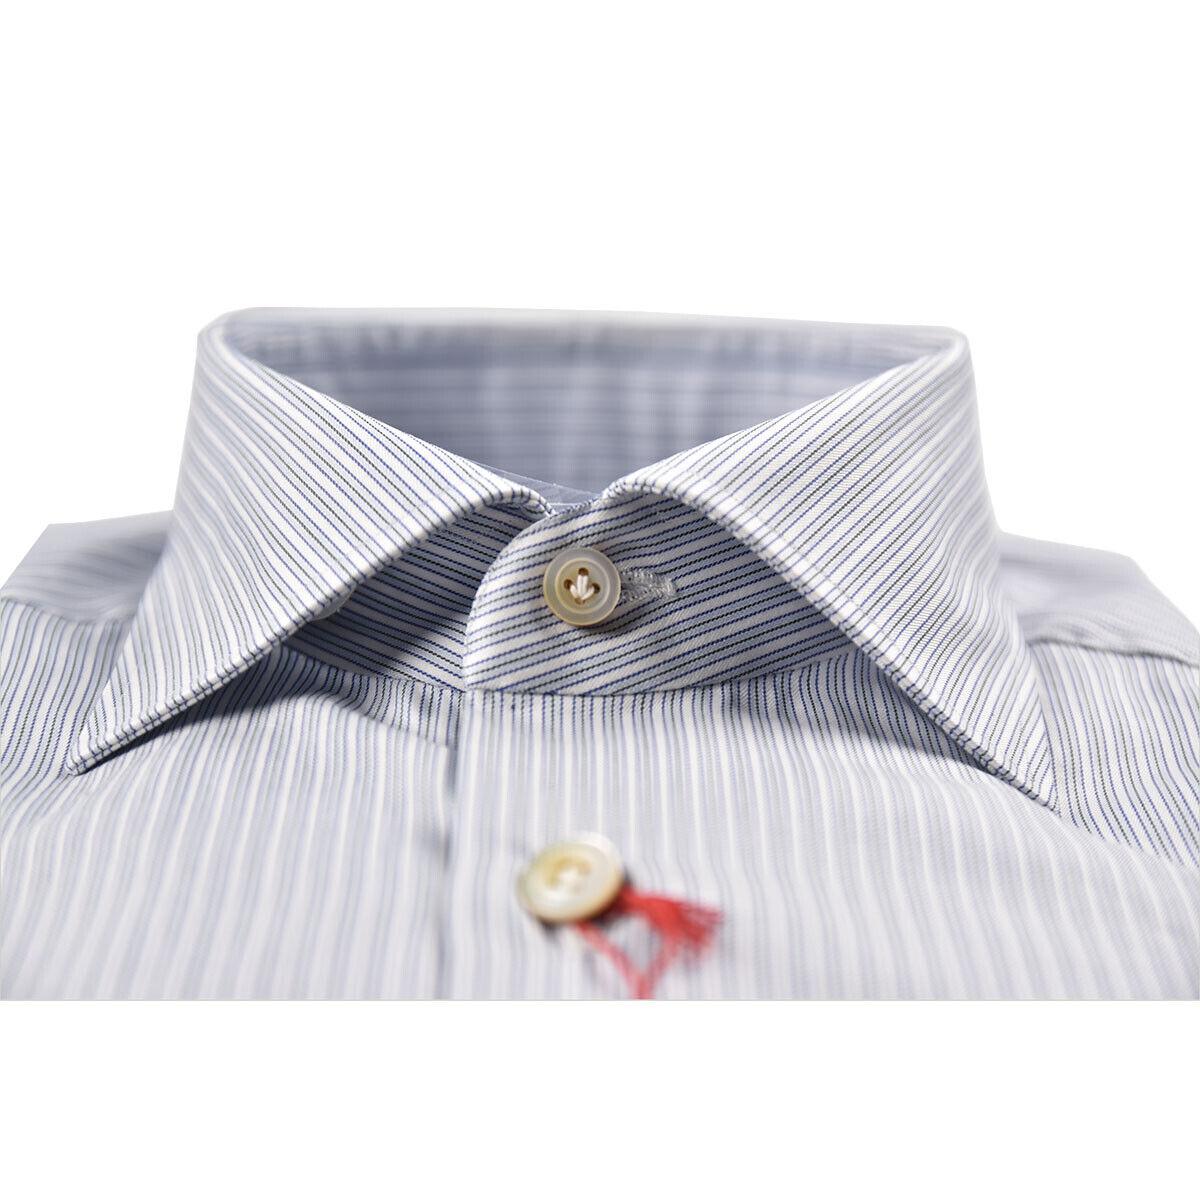 NEW KITON hemd 100% baumwolle MOD. UCCH 19H509